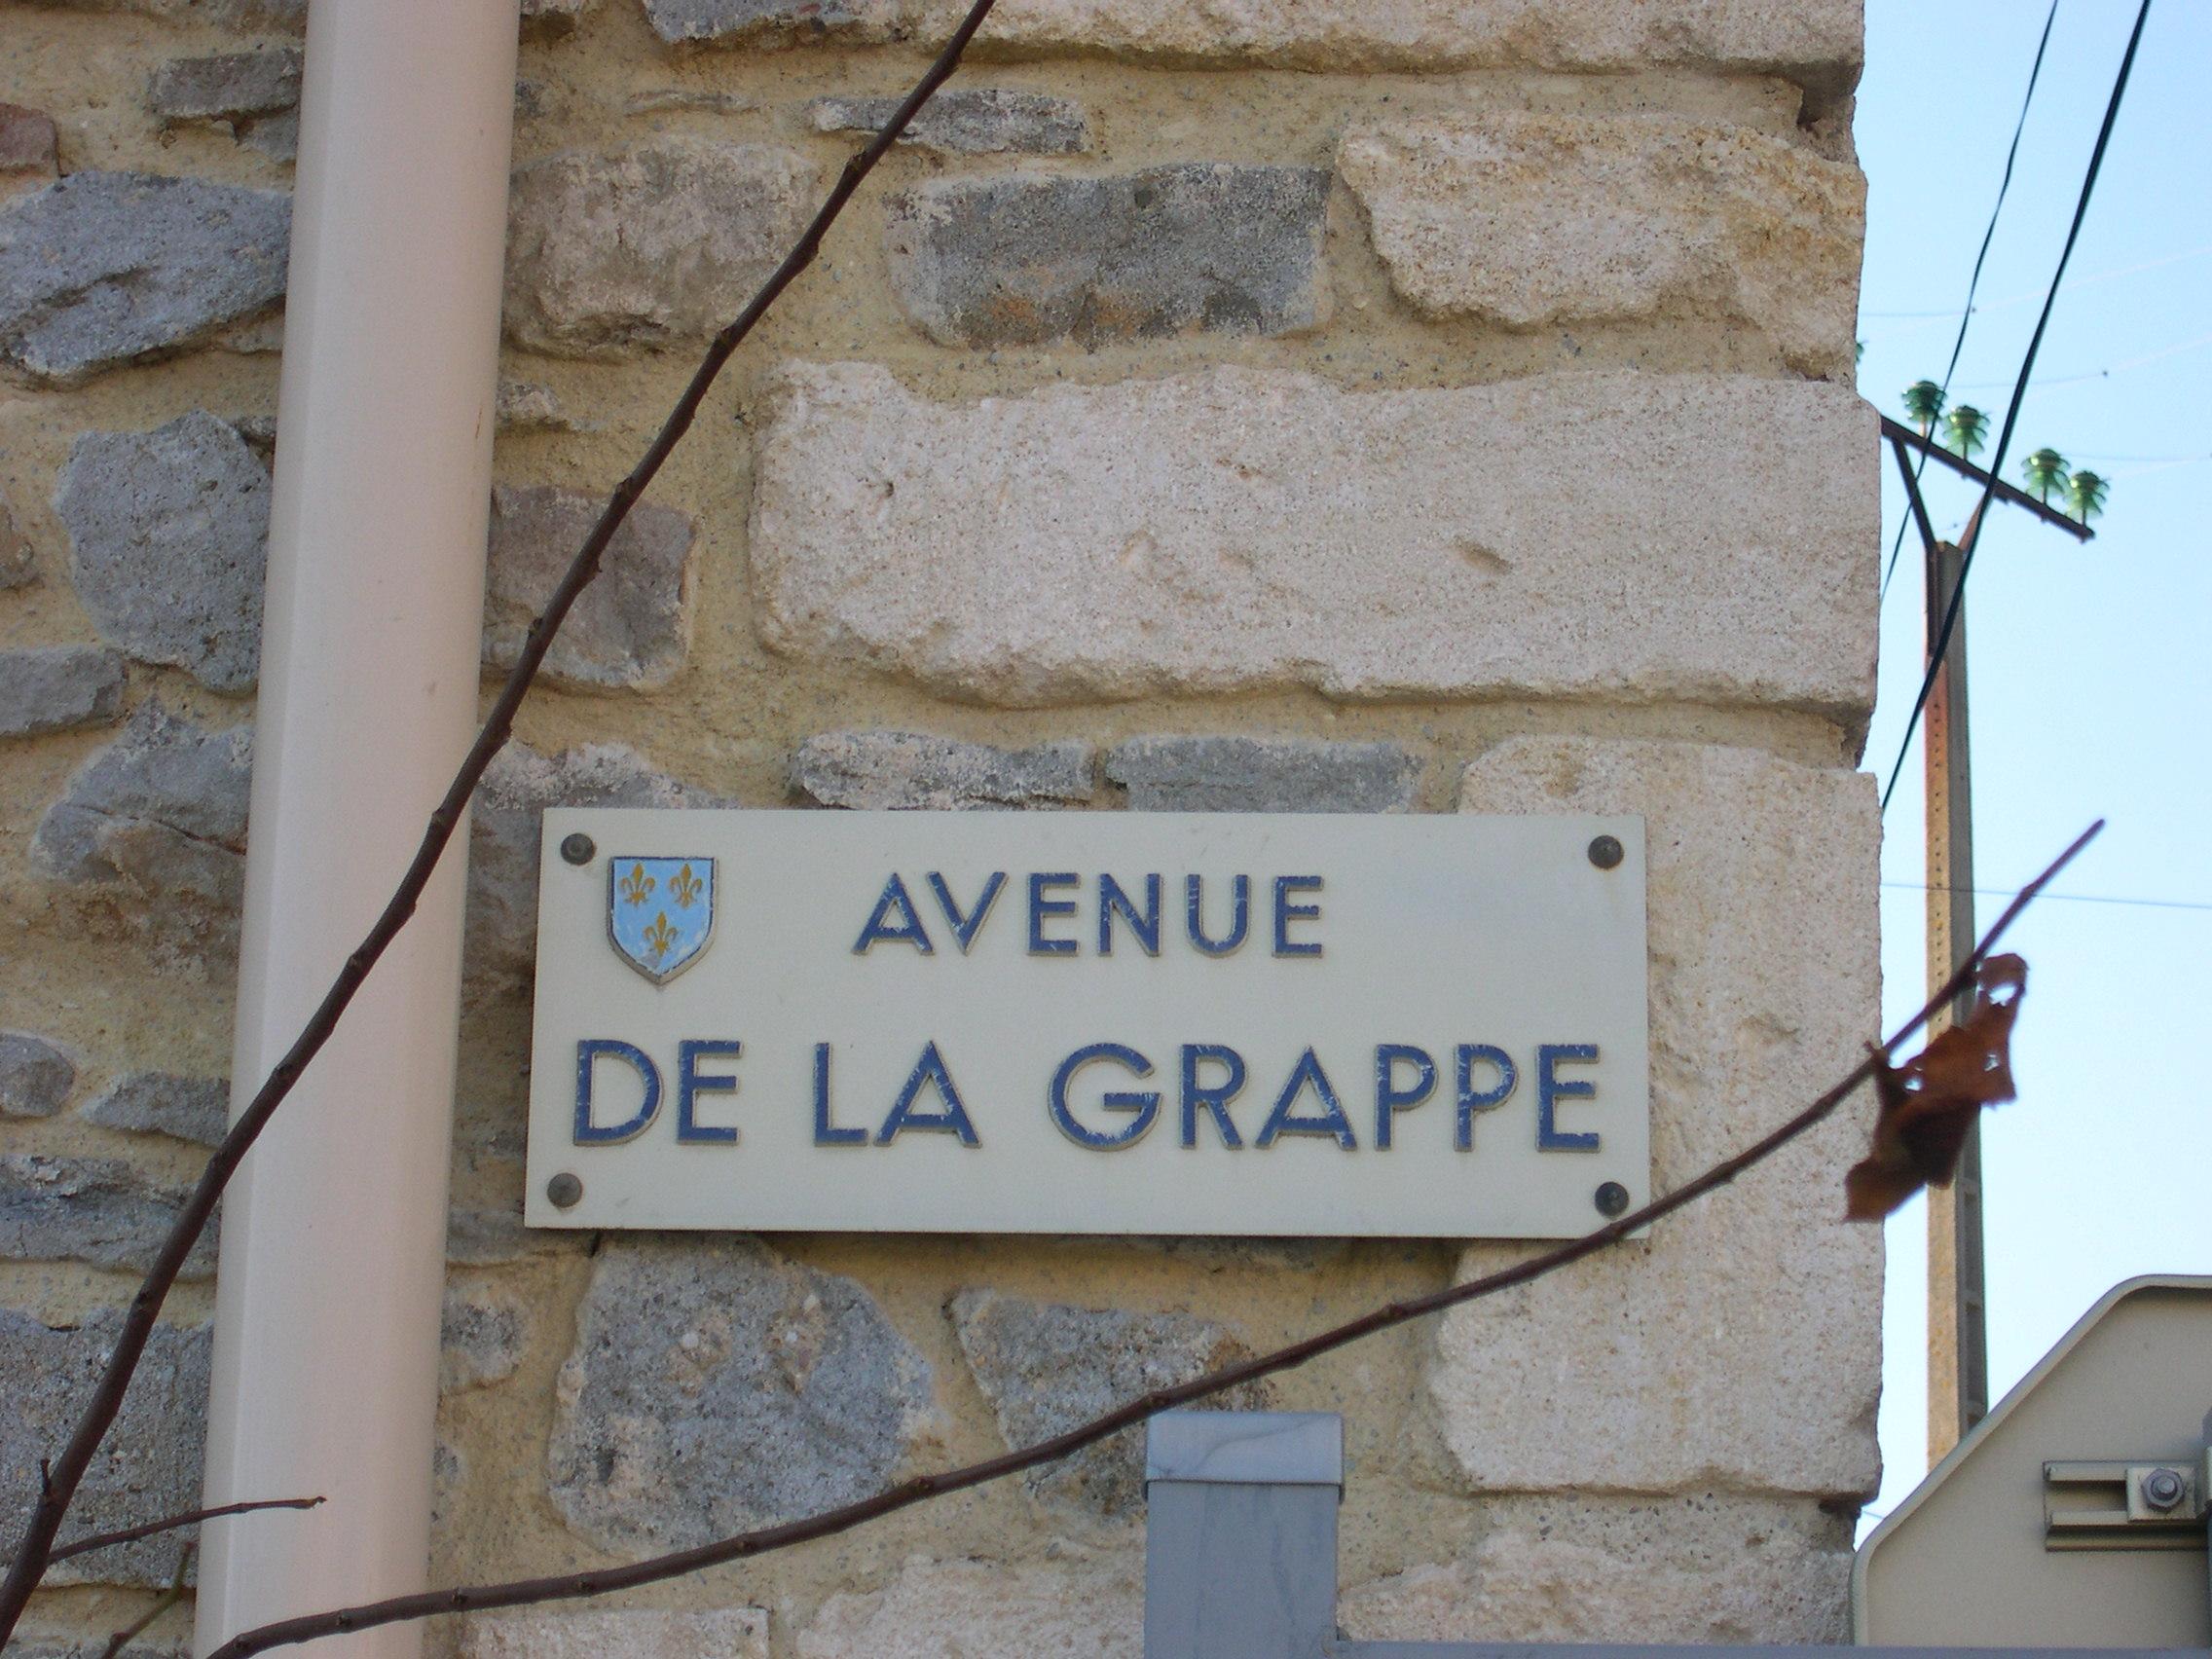 Avenue de la grappe